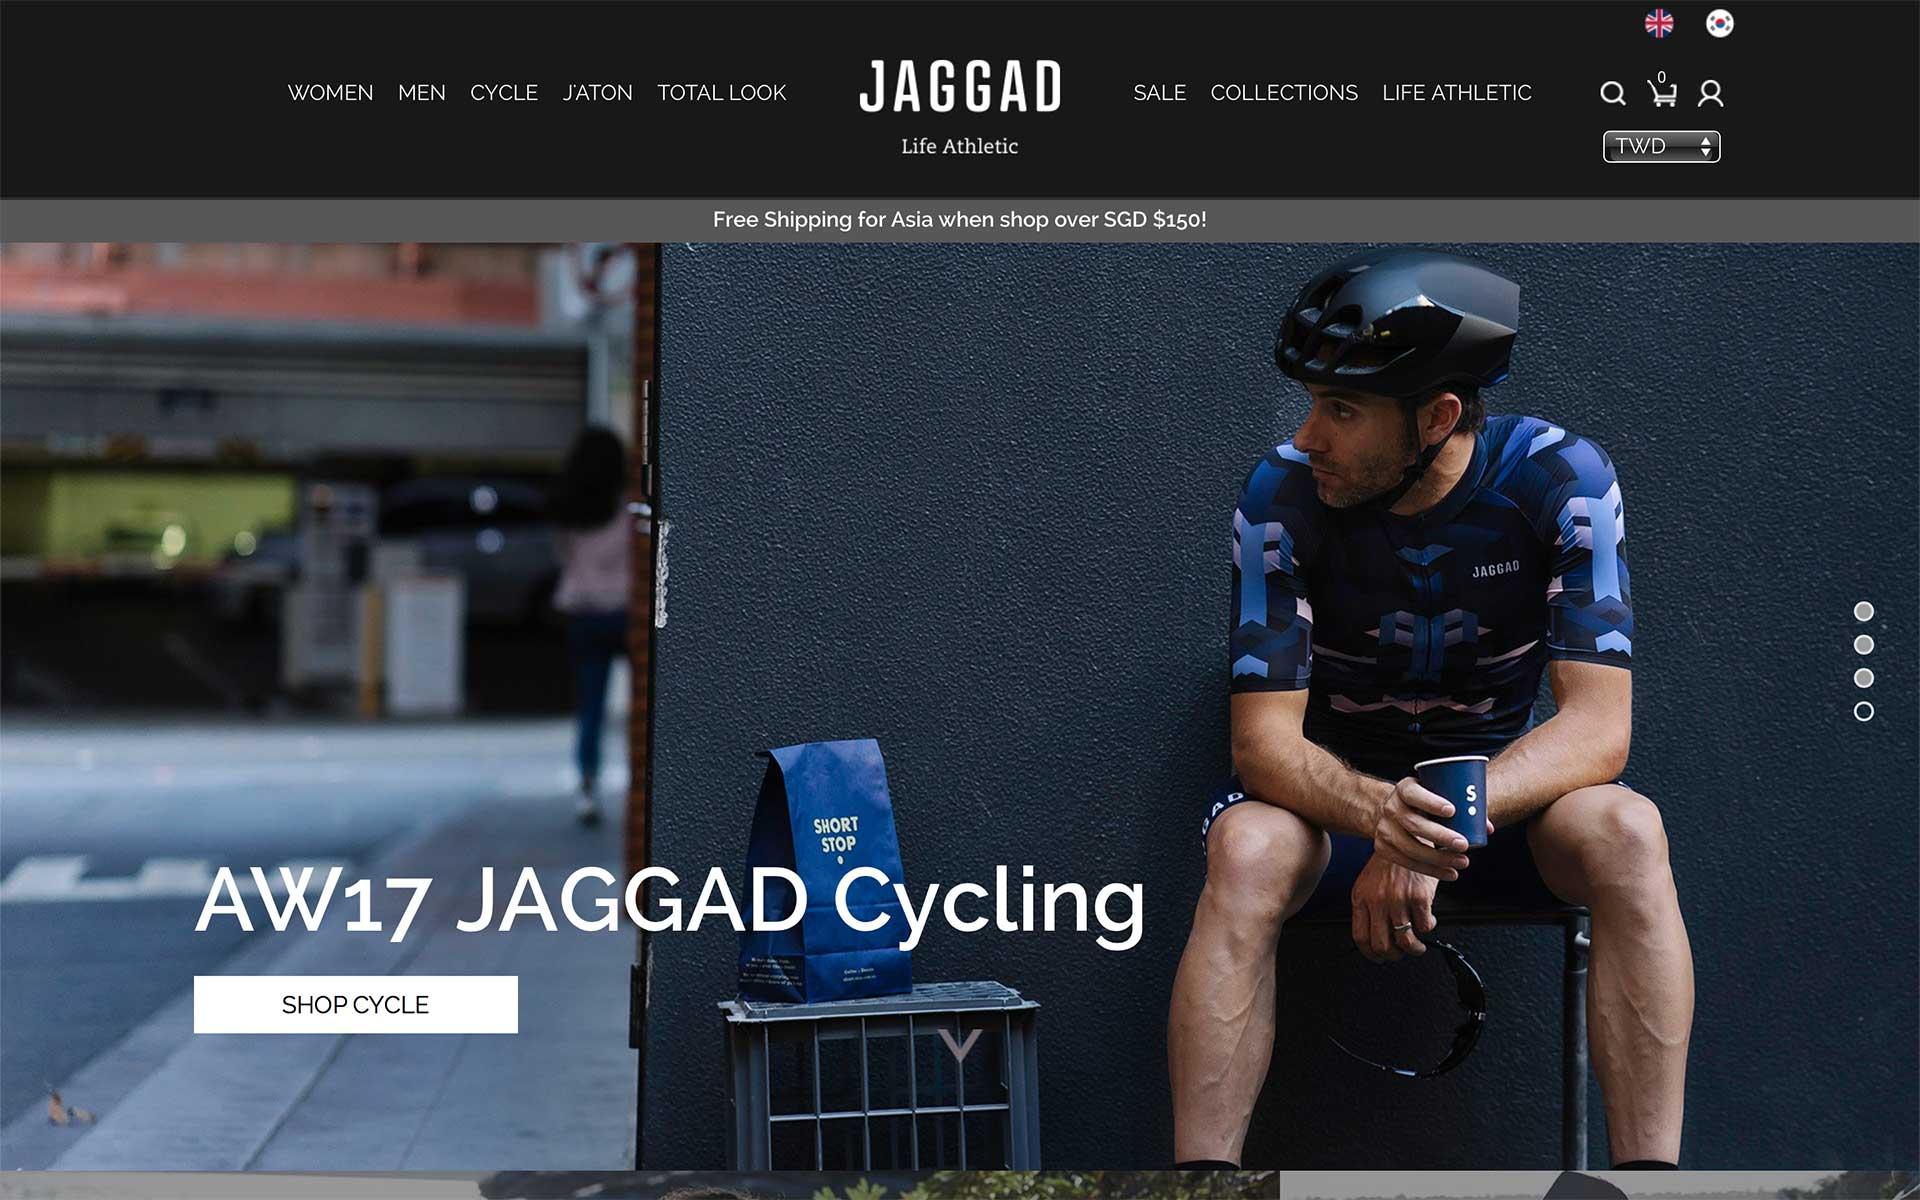 Jaggad 官方網站擷圖